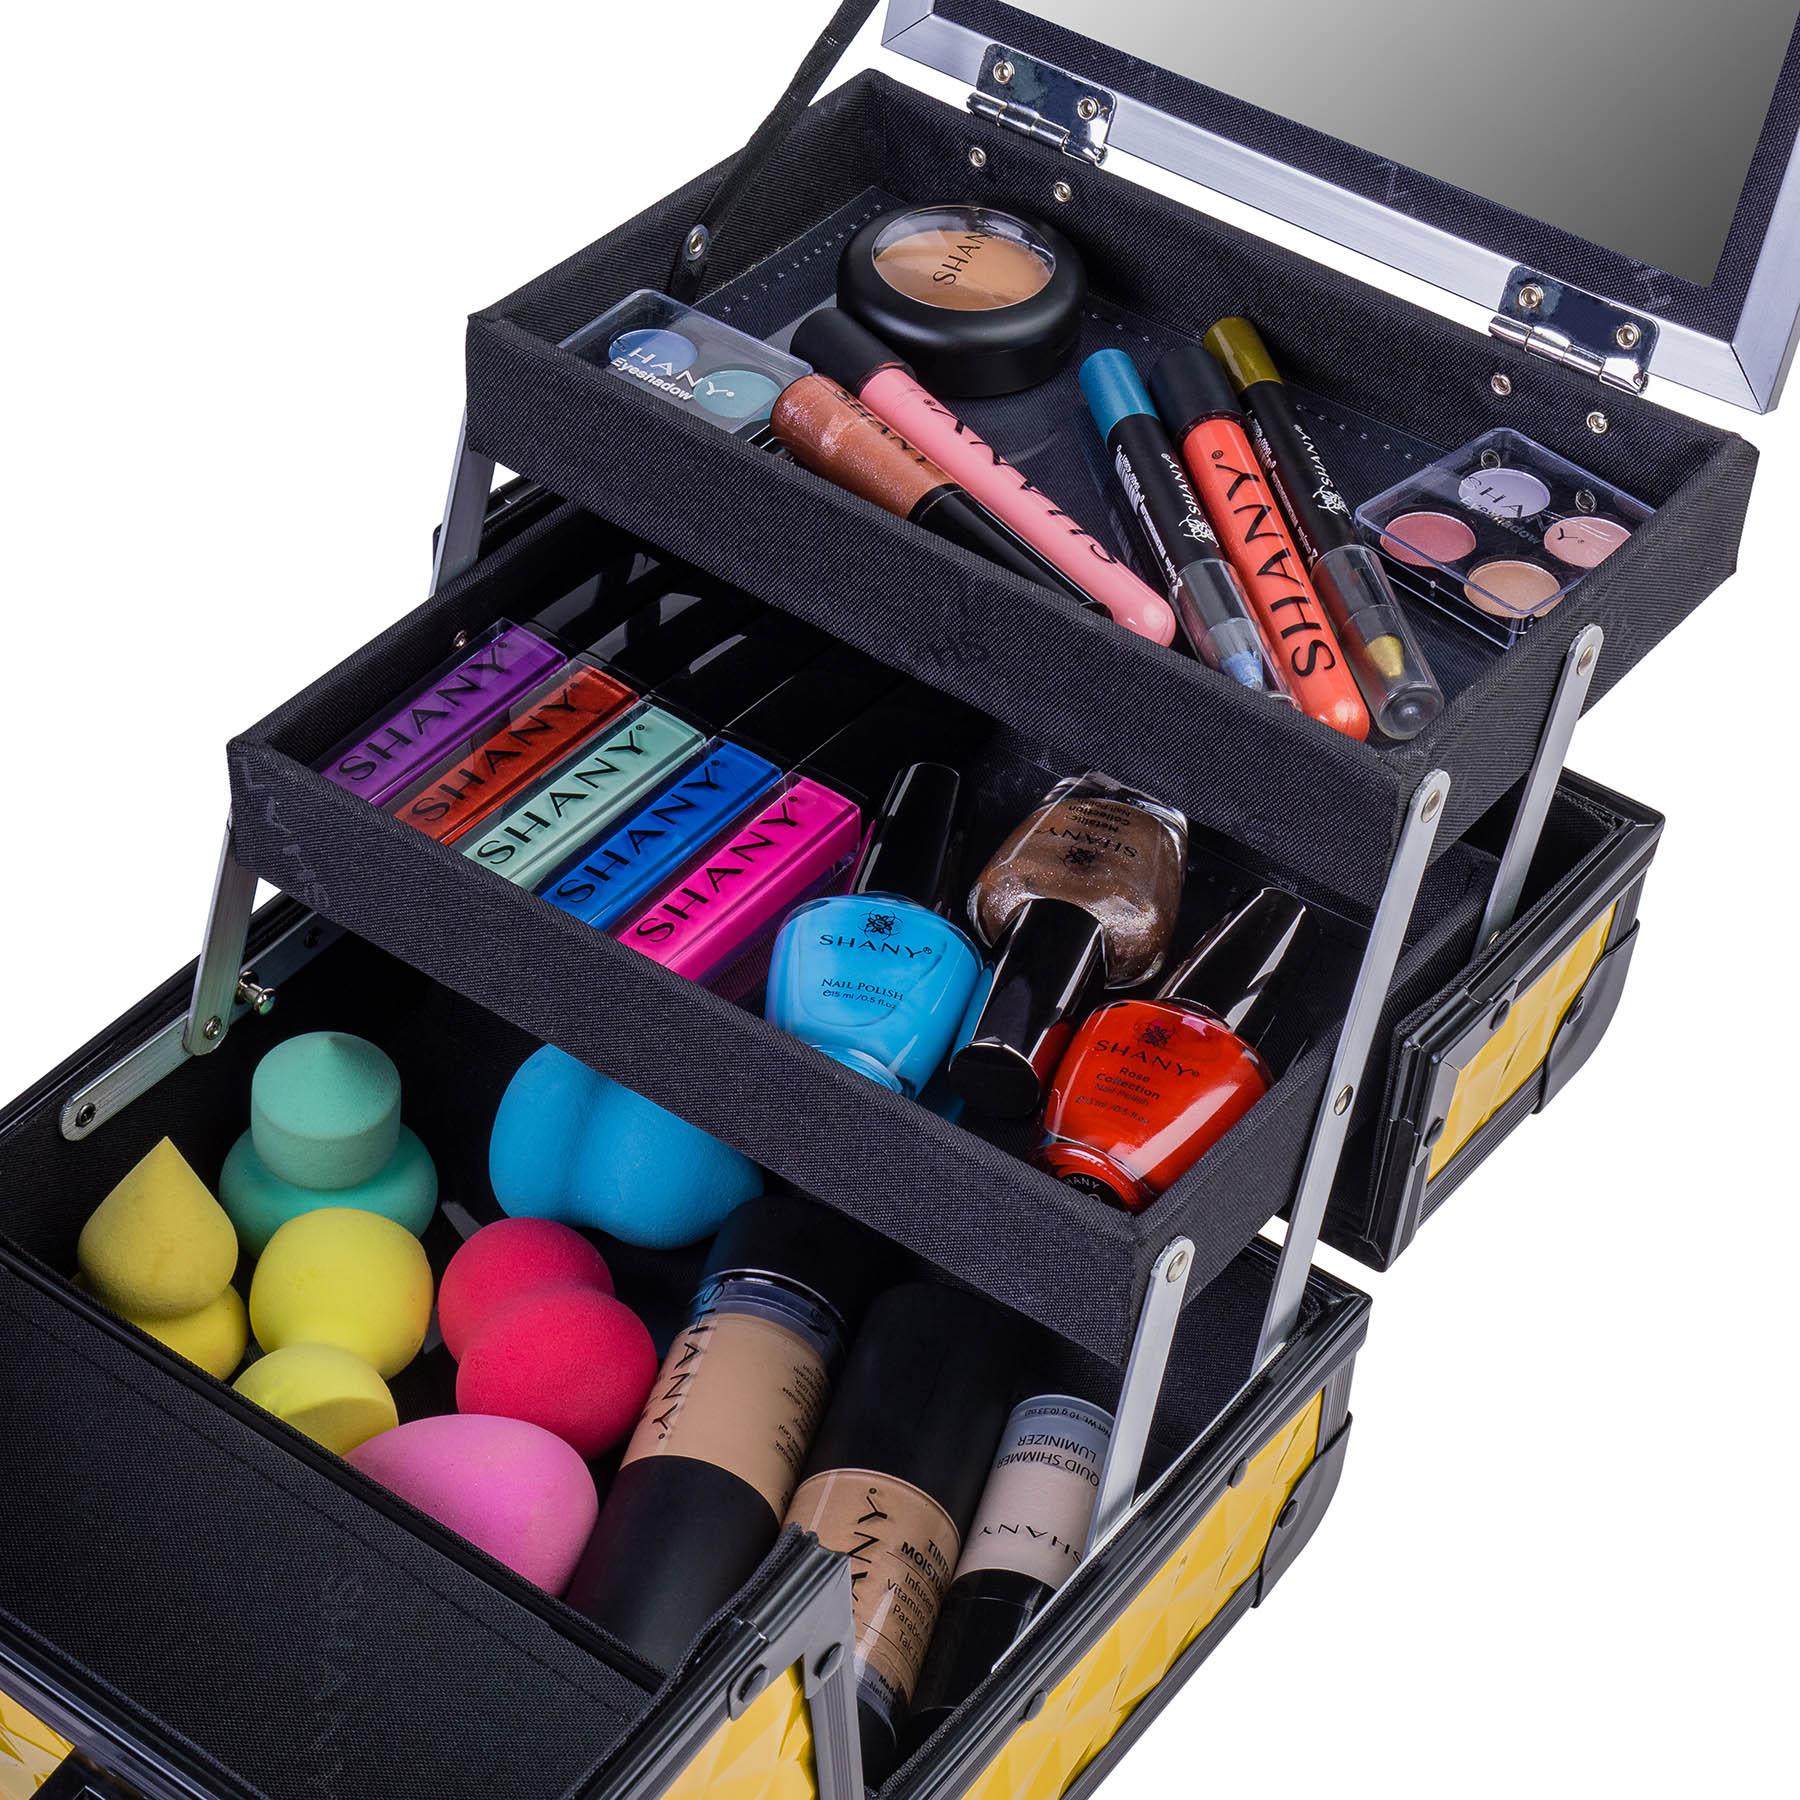 SHANY-Mini-Makeup-Train-Case-With-Mirror miniature 33